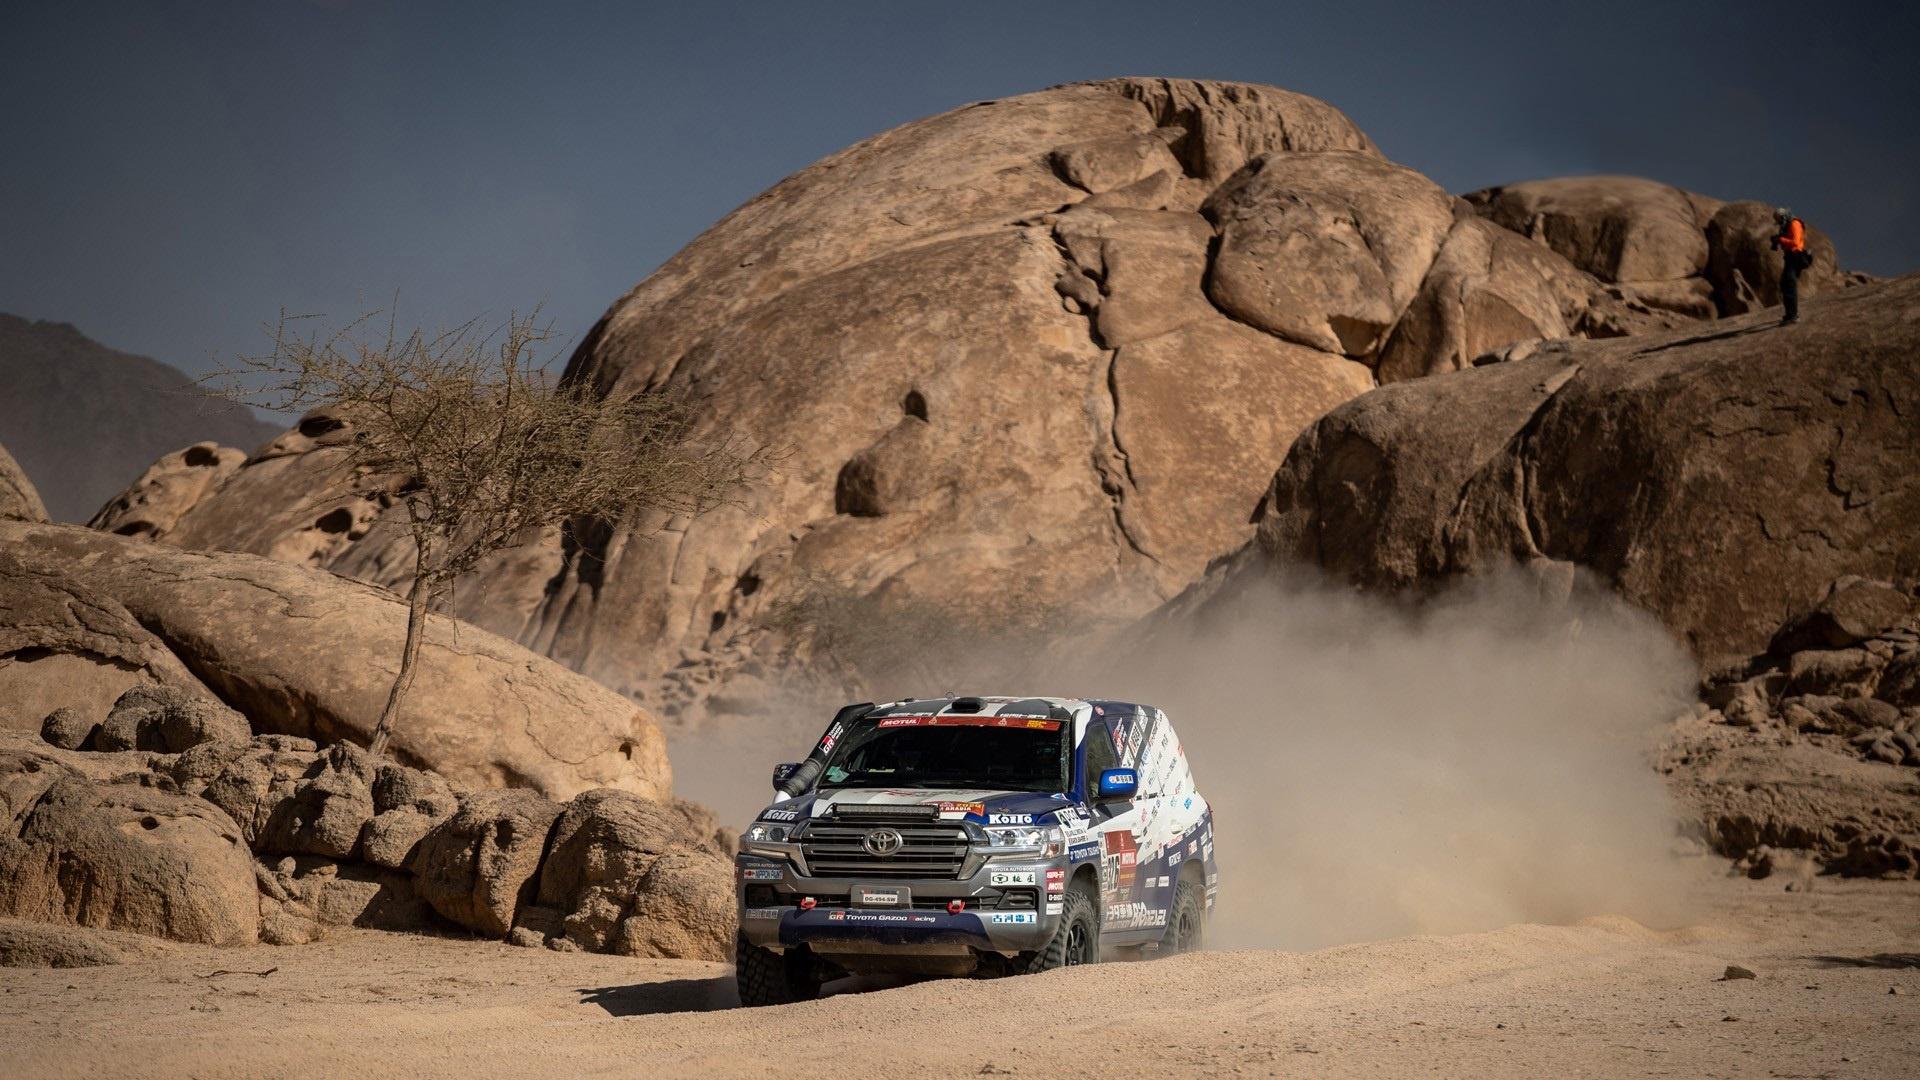 Toyota celebrates another outstanding performance at Dakar 2021 in Saudi Arabia